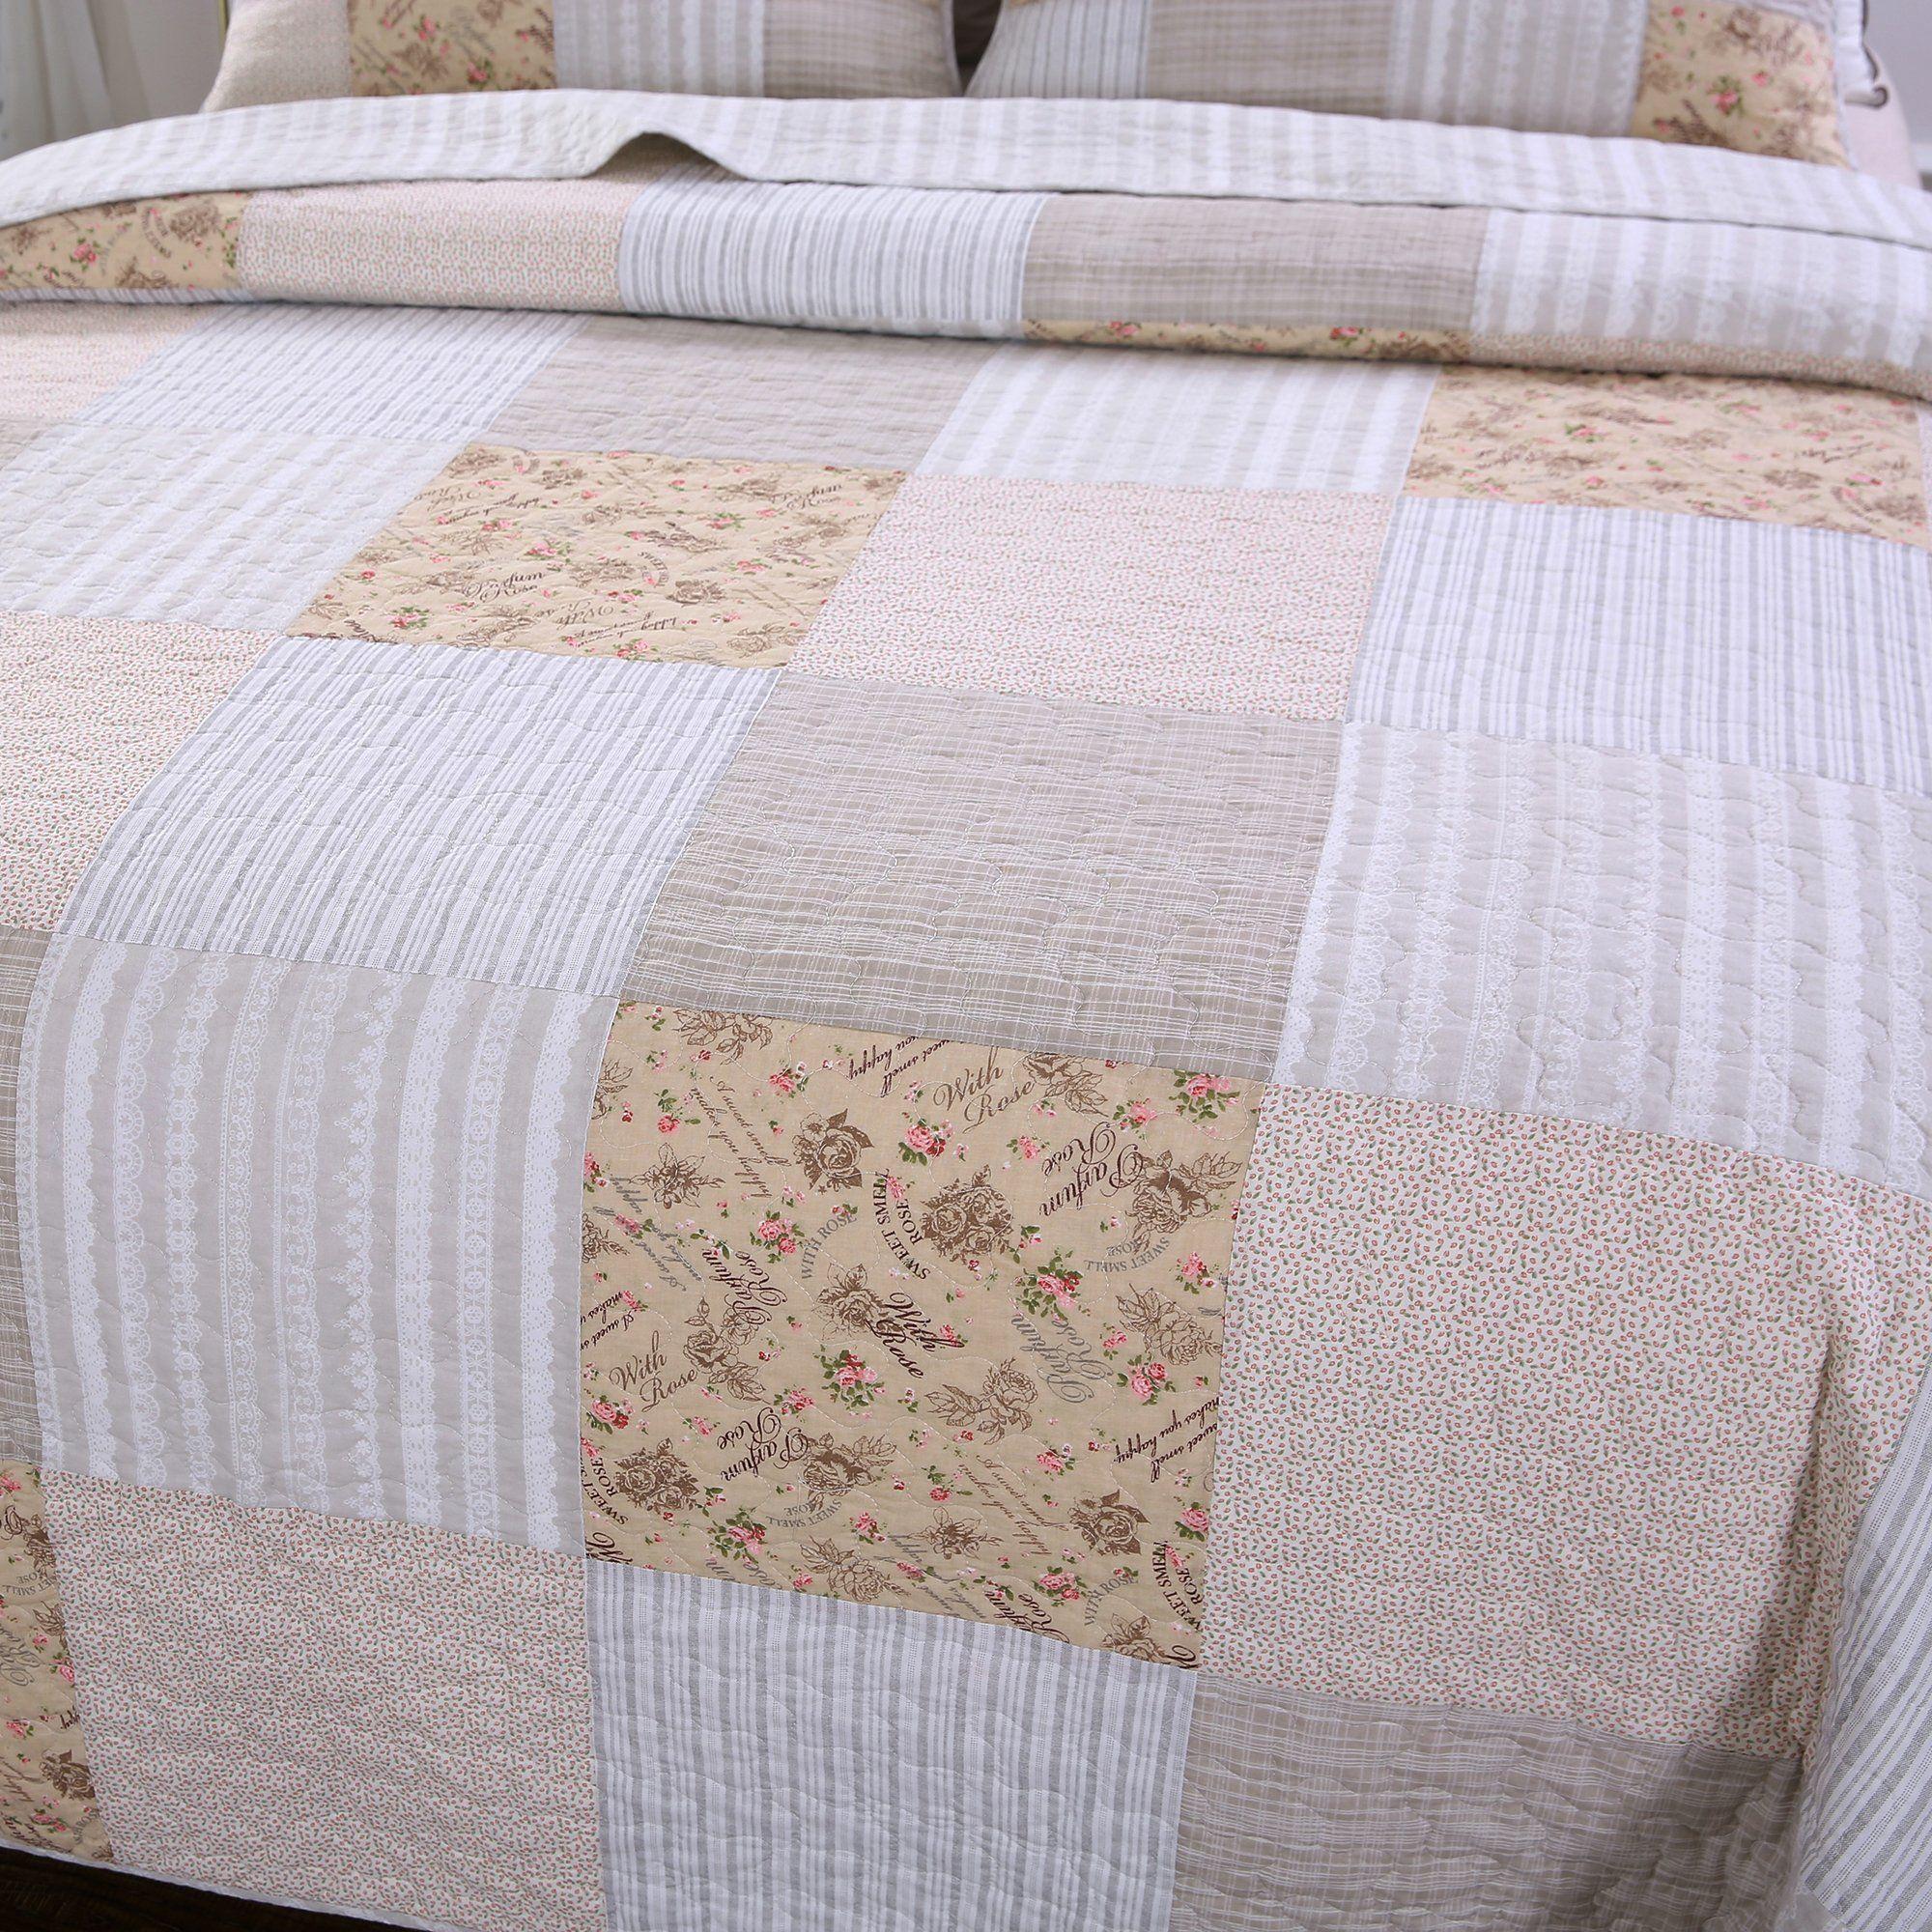 Slpr Country Lane 3 Piece Real Patchwork Cotton Quilt Set Queen